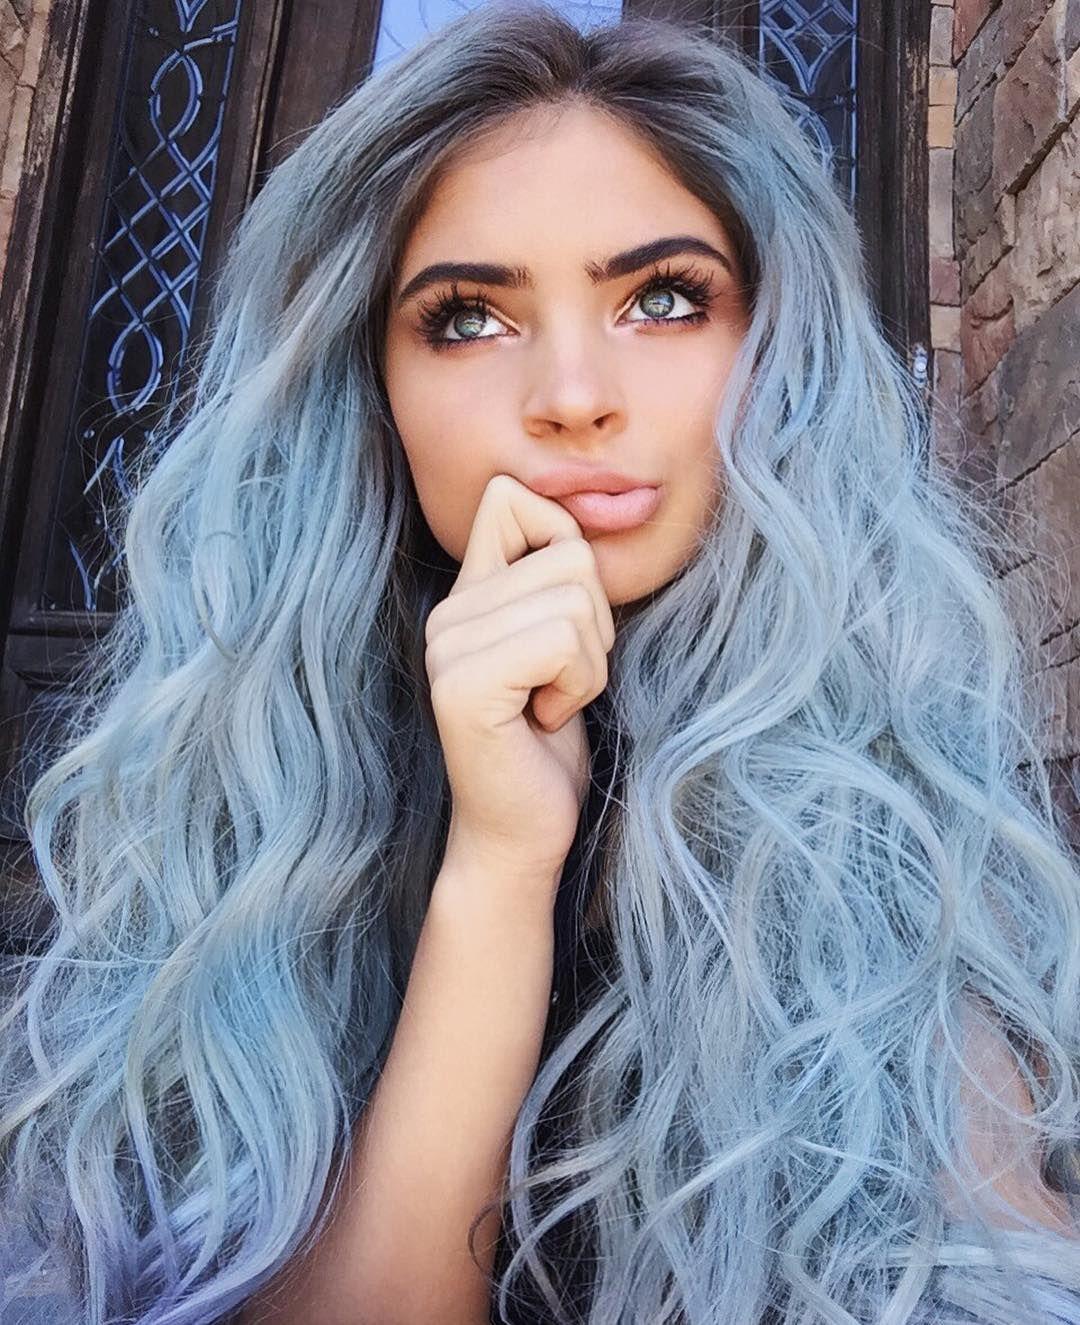 ゚ Angrydinosaurx Hair Color Pastel Hair Styles Dyed Hair